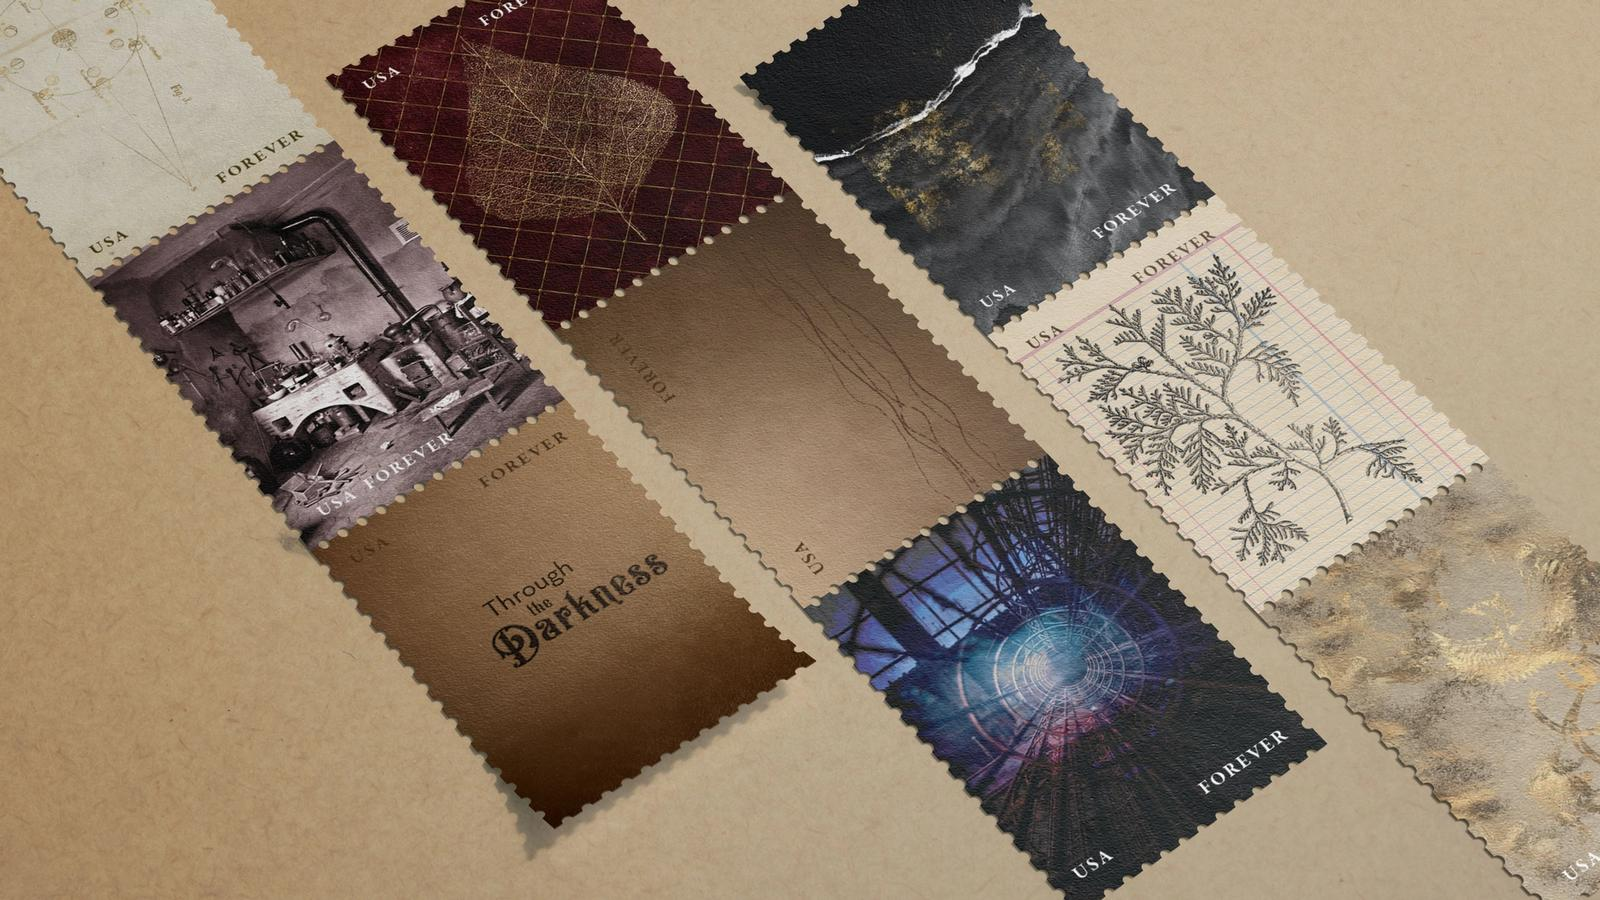 Through the Darkness // Guillermo del Toro Film Festival Stamps